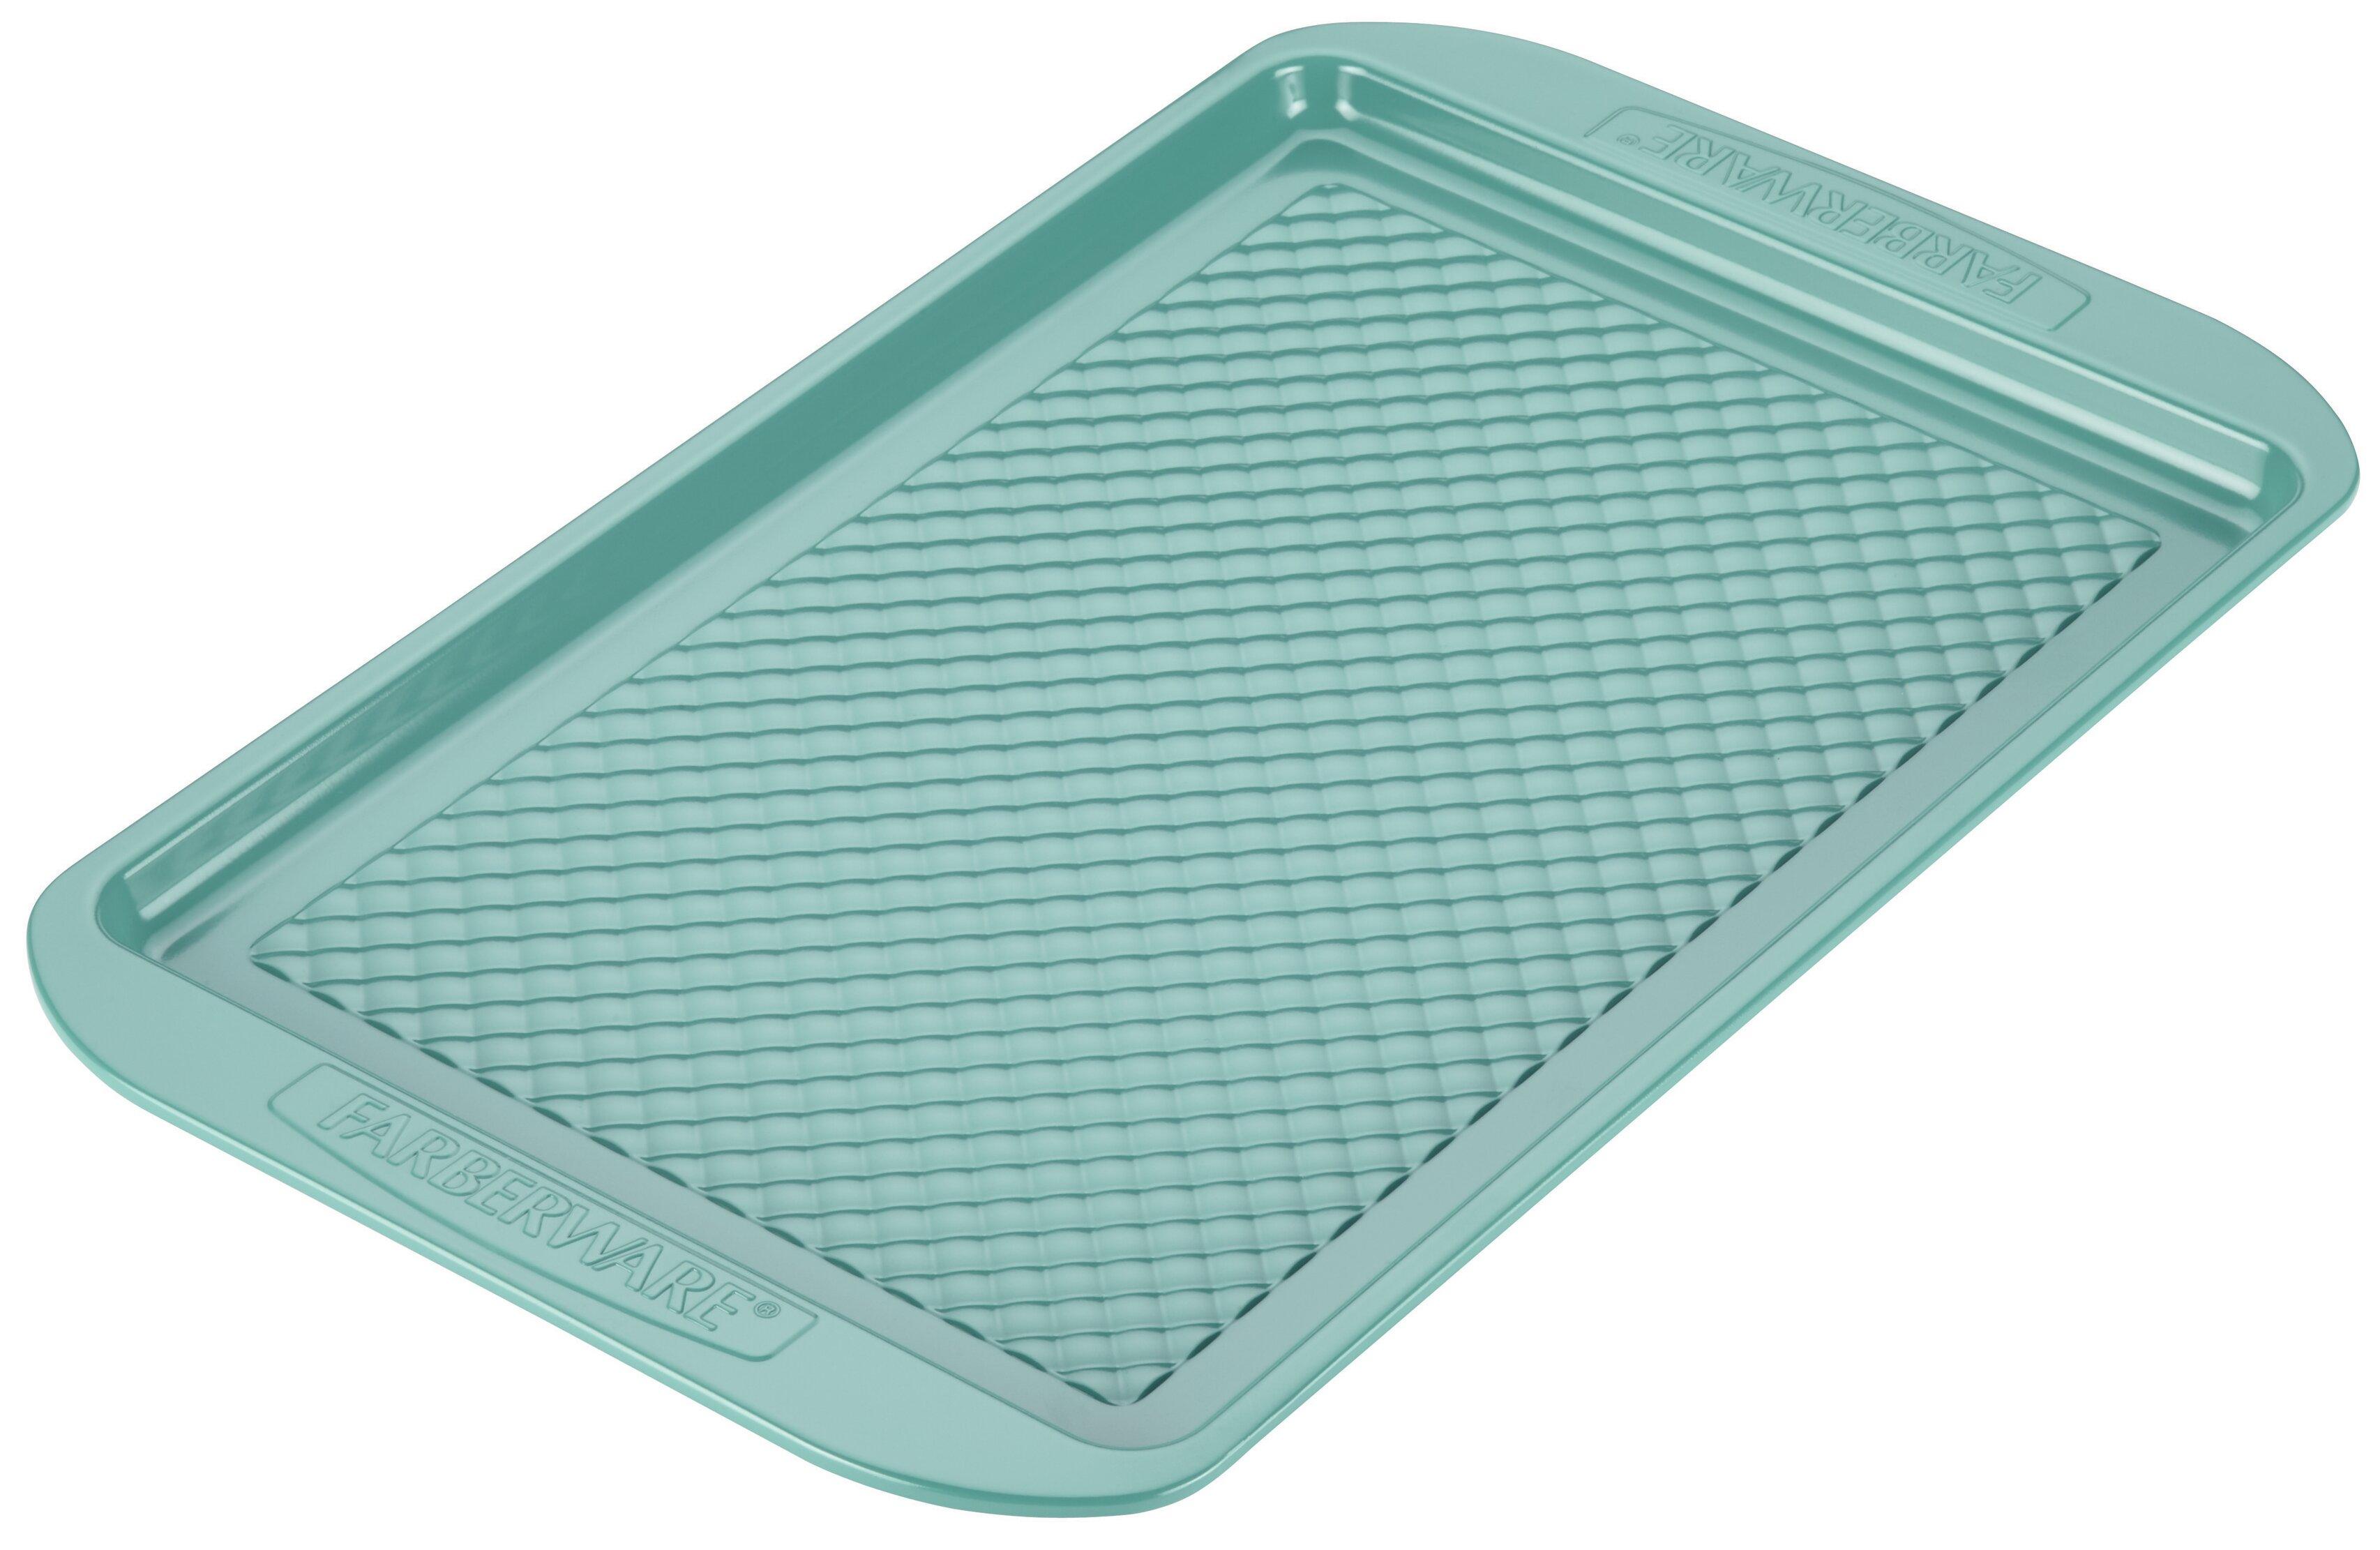 Farberware Purecook Hybrid Ceramic Nonstick Bakeware Baking Sheet ...